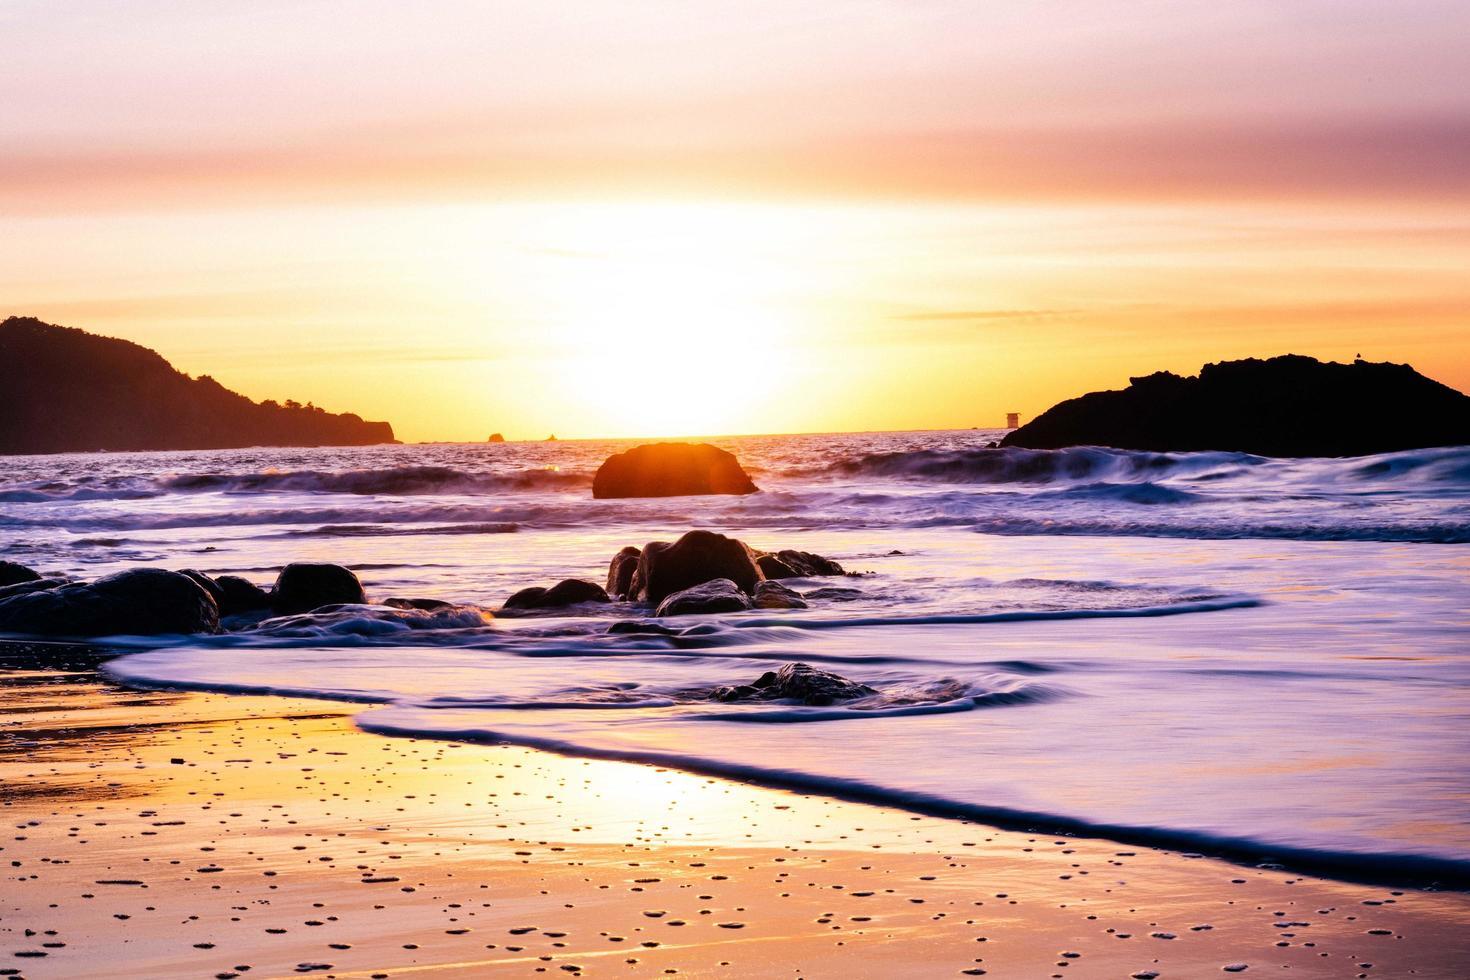 Sonnenuntergang über dem Horizont am Strand foto